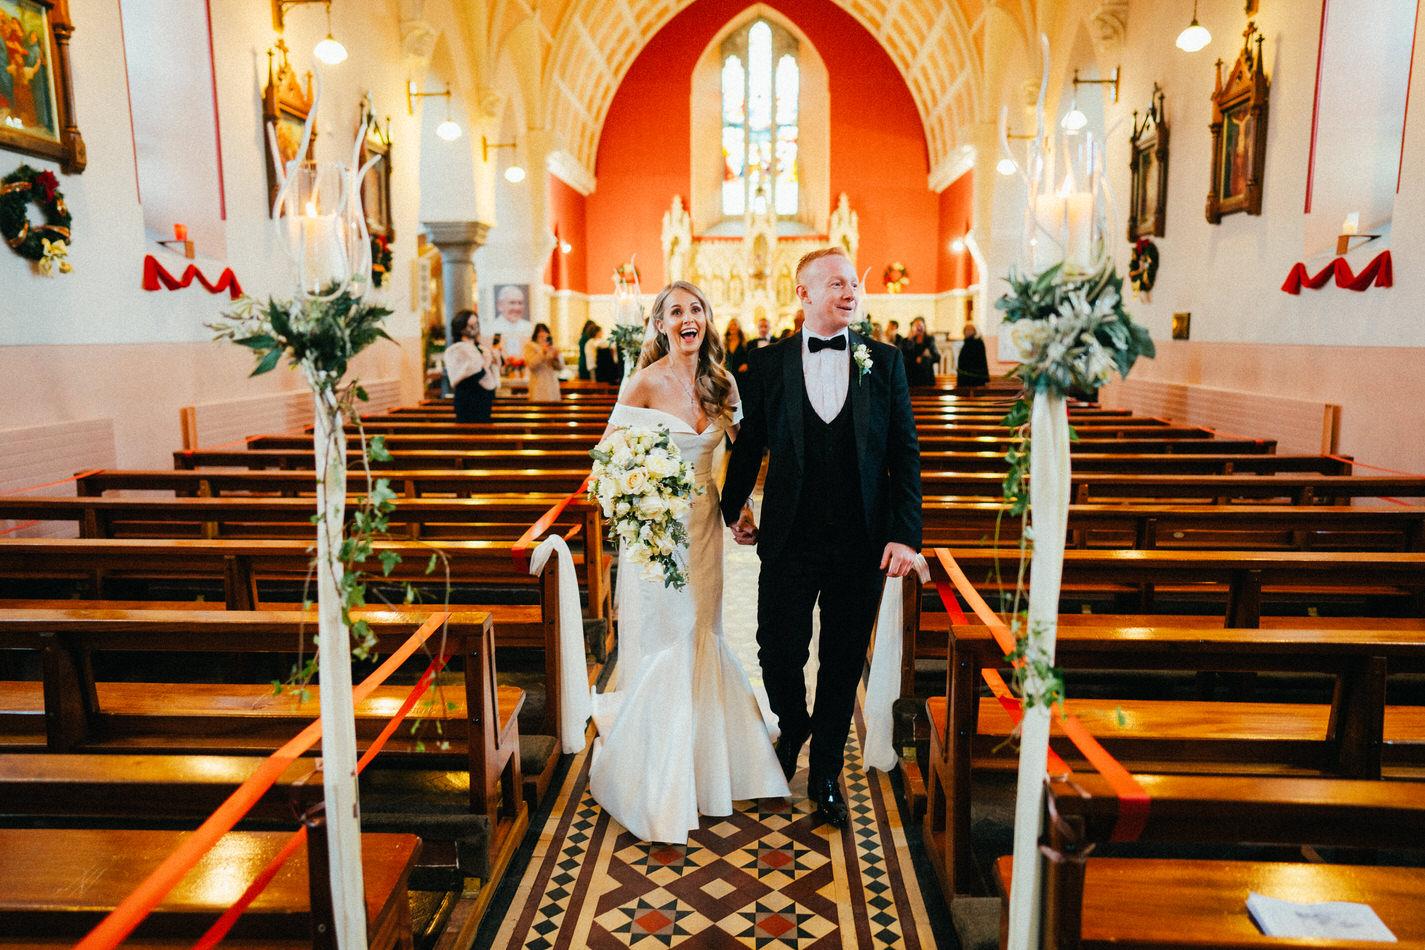 Castle-wedding-ireland-photos- 0146 99